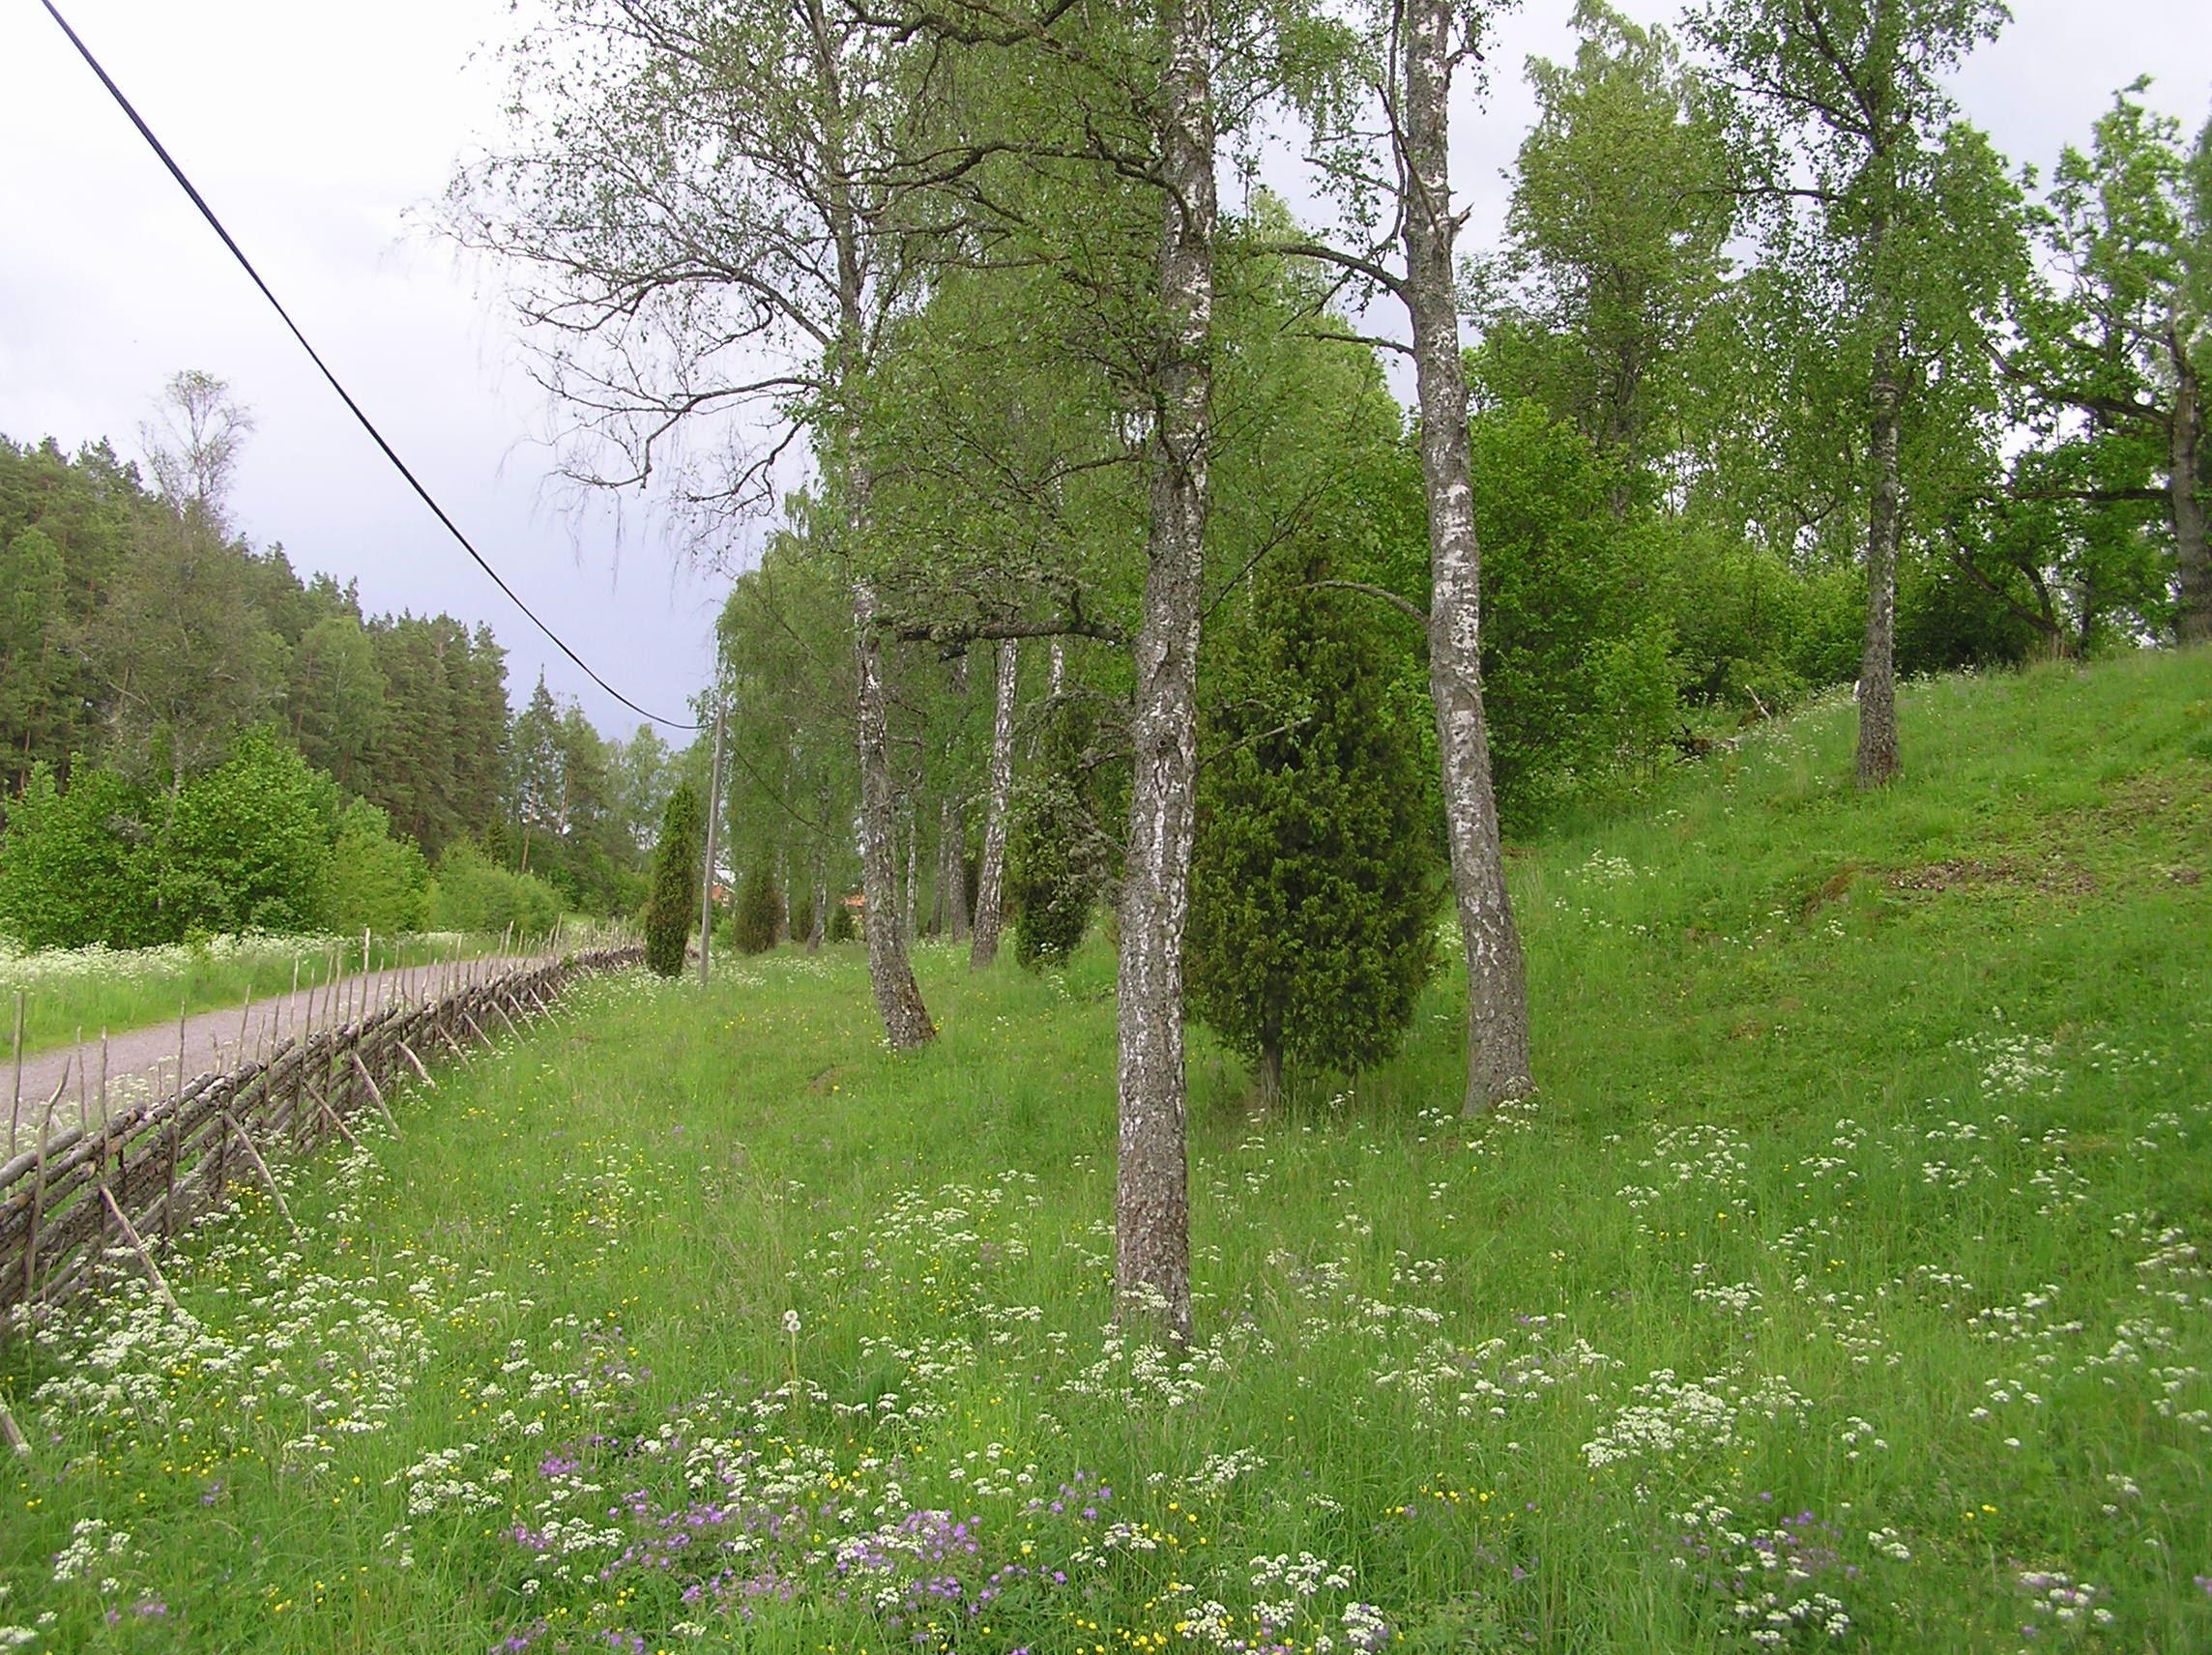 Charlotta Larsson ,  © Länsstyrelsen i Kalmar län, Narturreservat Lunden